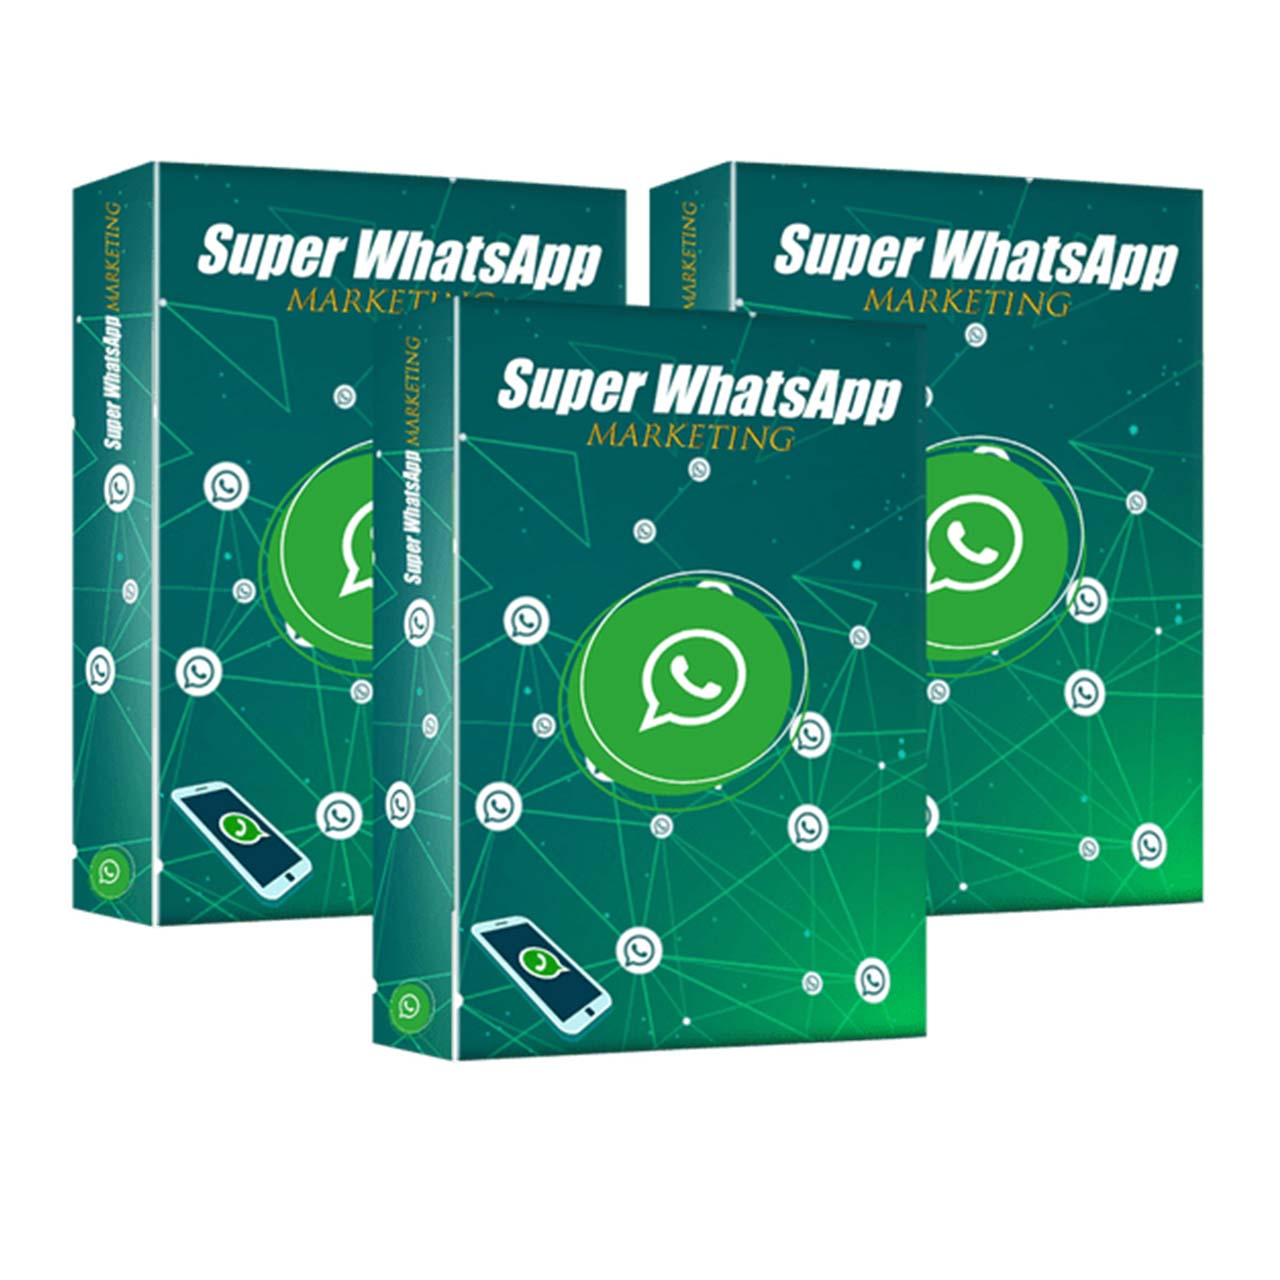 Super WhatsApp Marketing